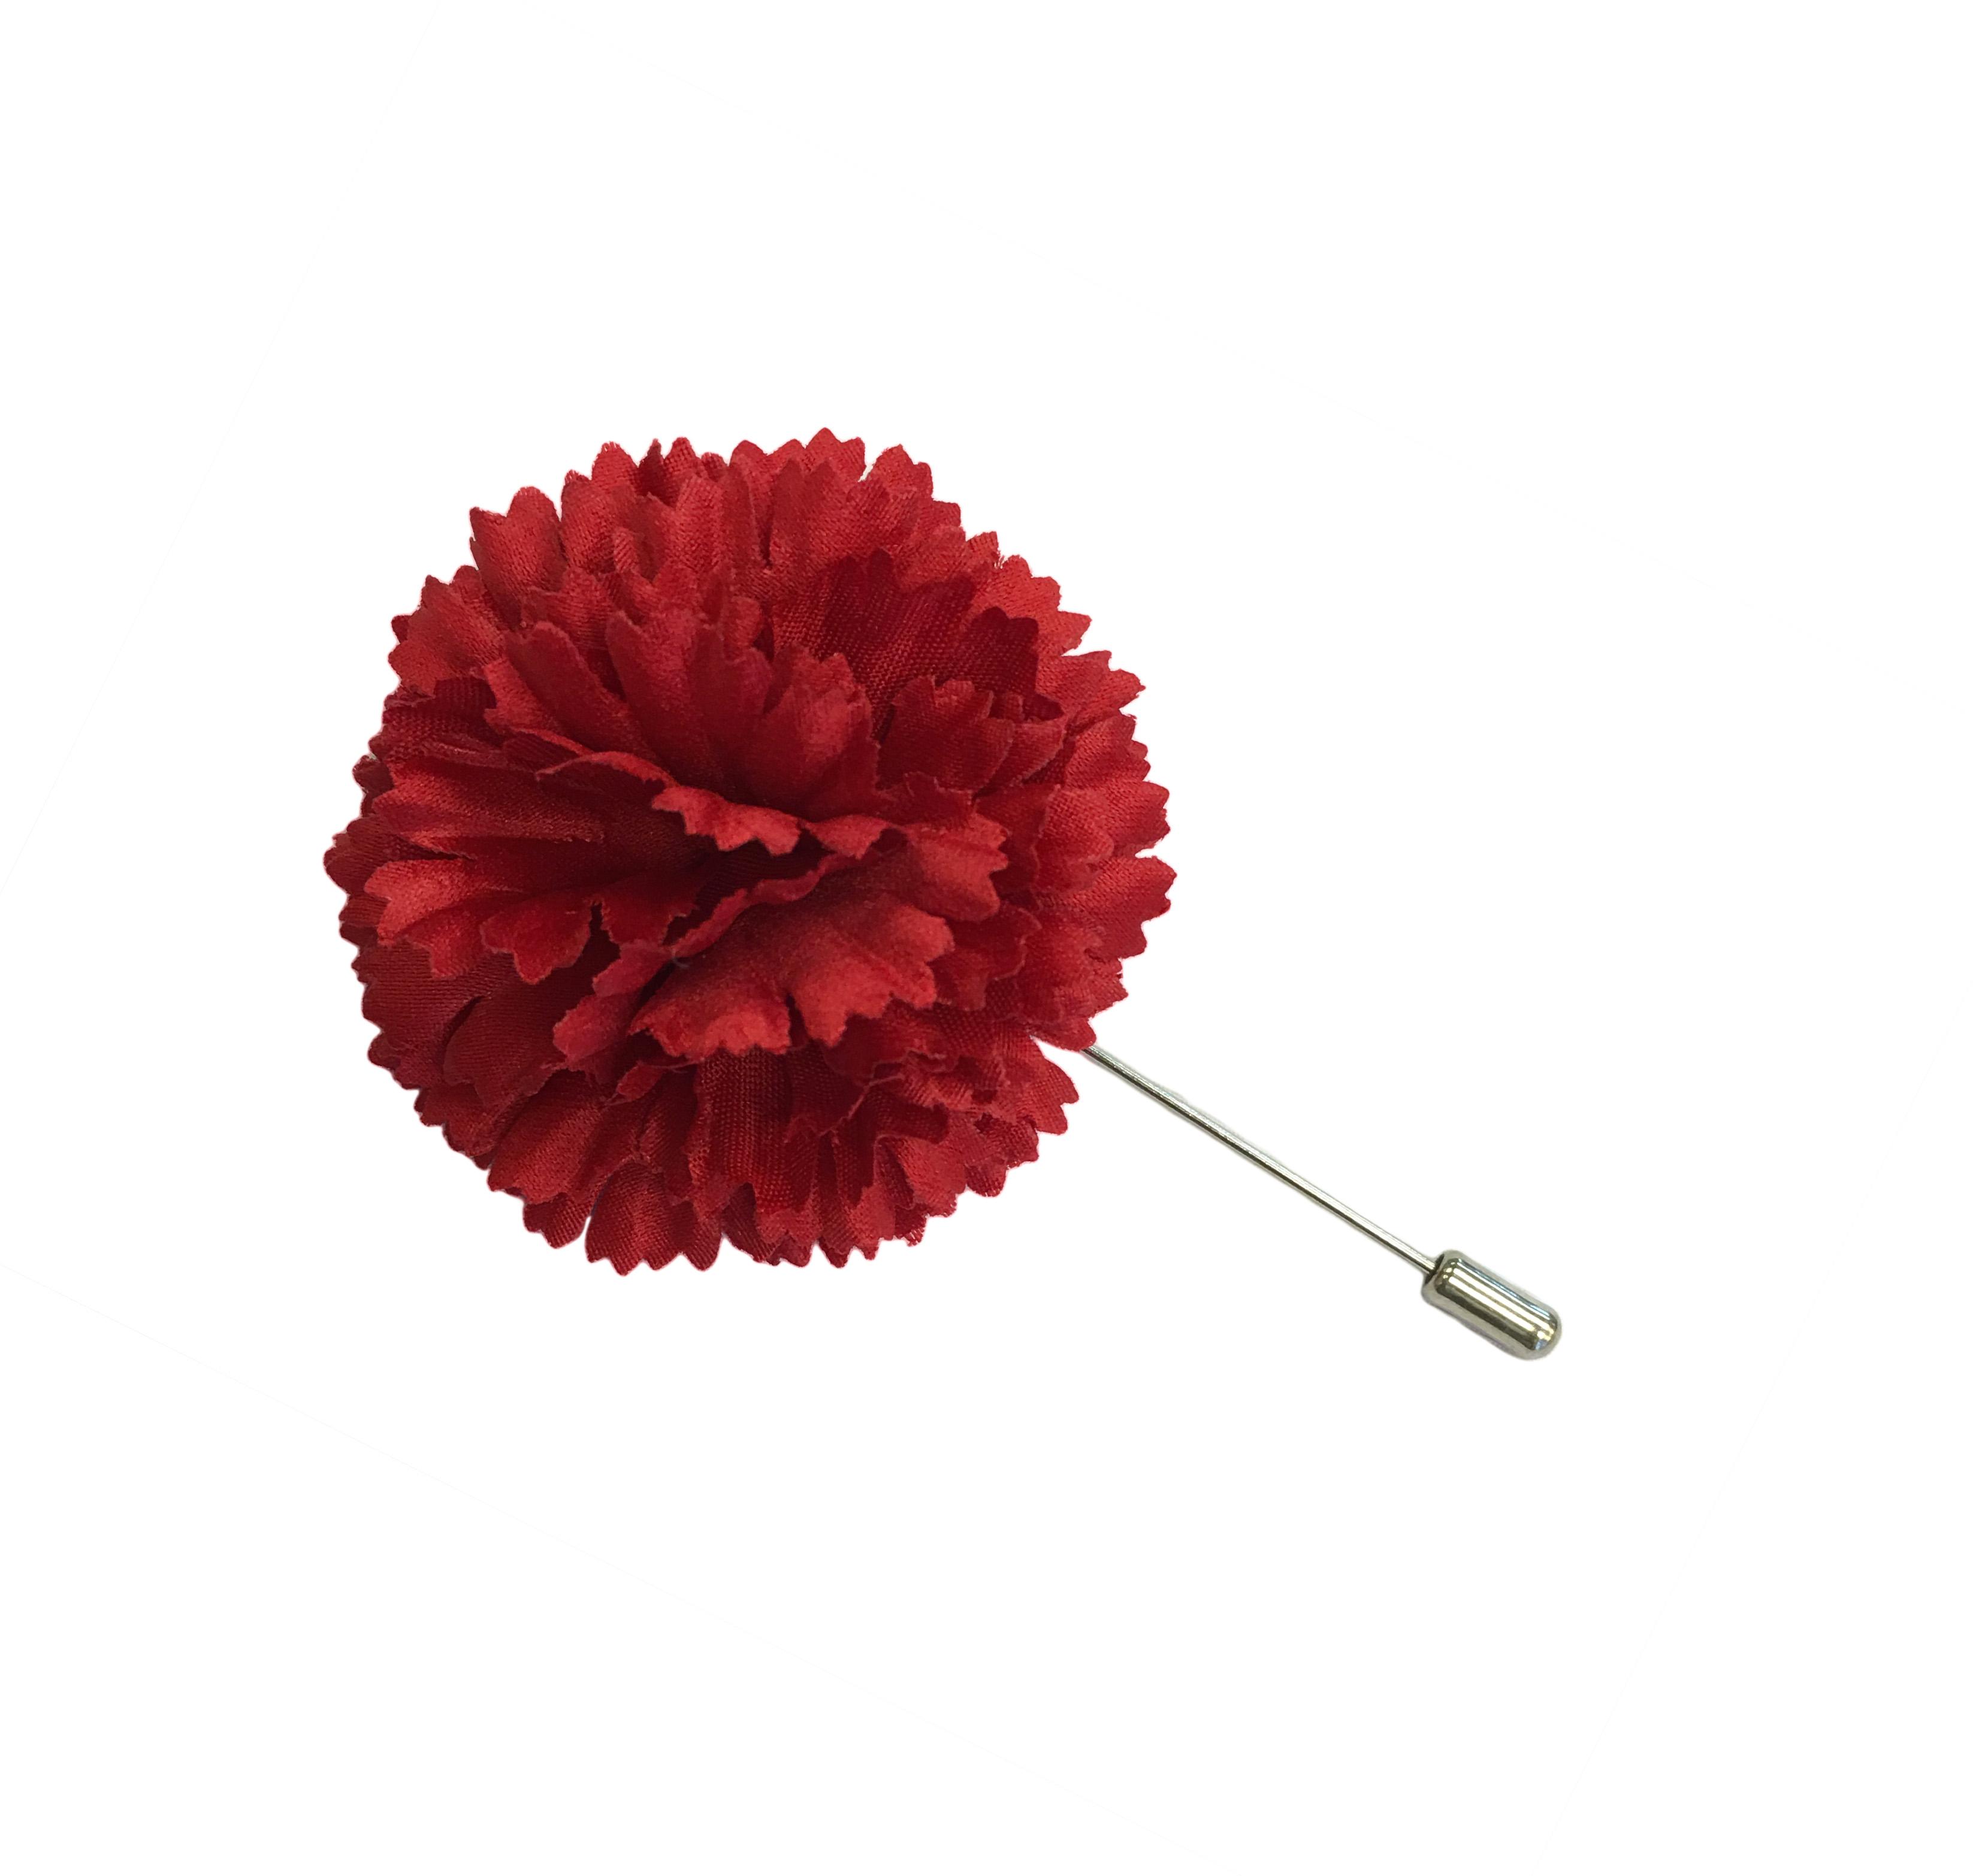 2 Red Silk Satin Carnation Lapel Pin Ms Schmalberg